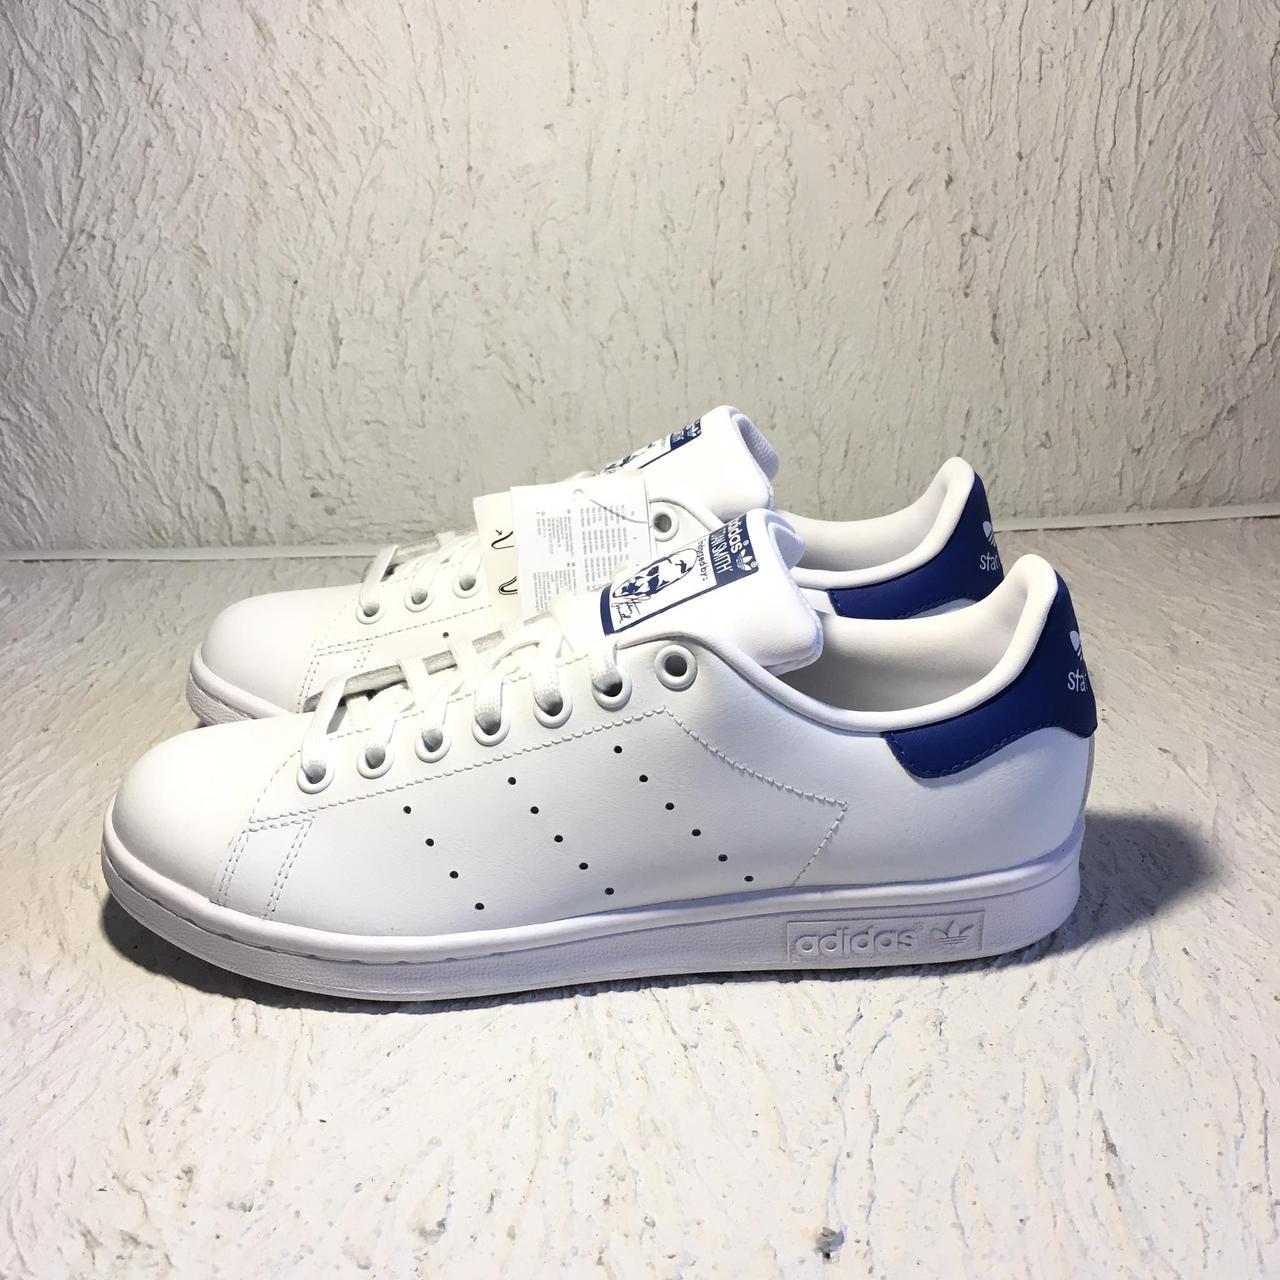 Кроссовки adidas stan smith   38.2/3 р       S74778